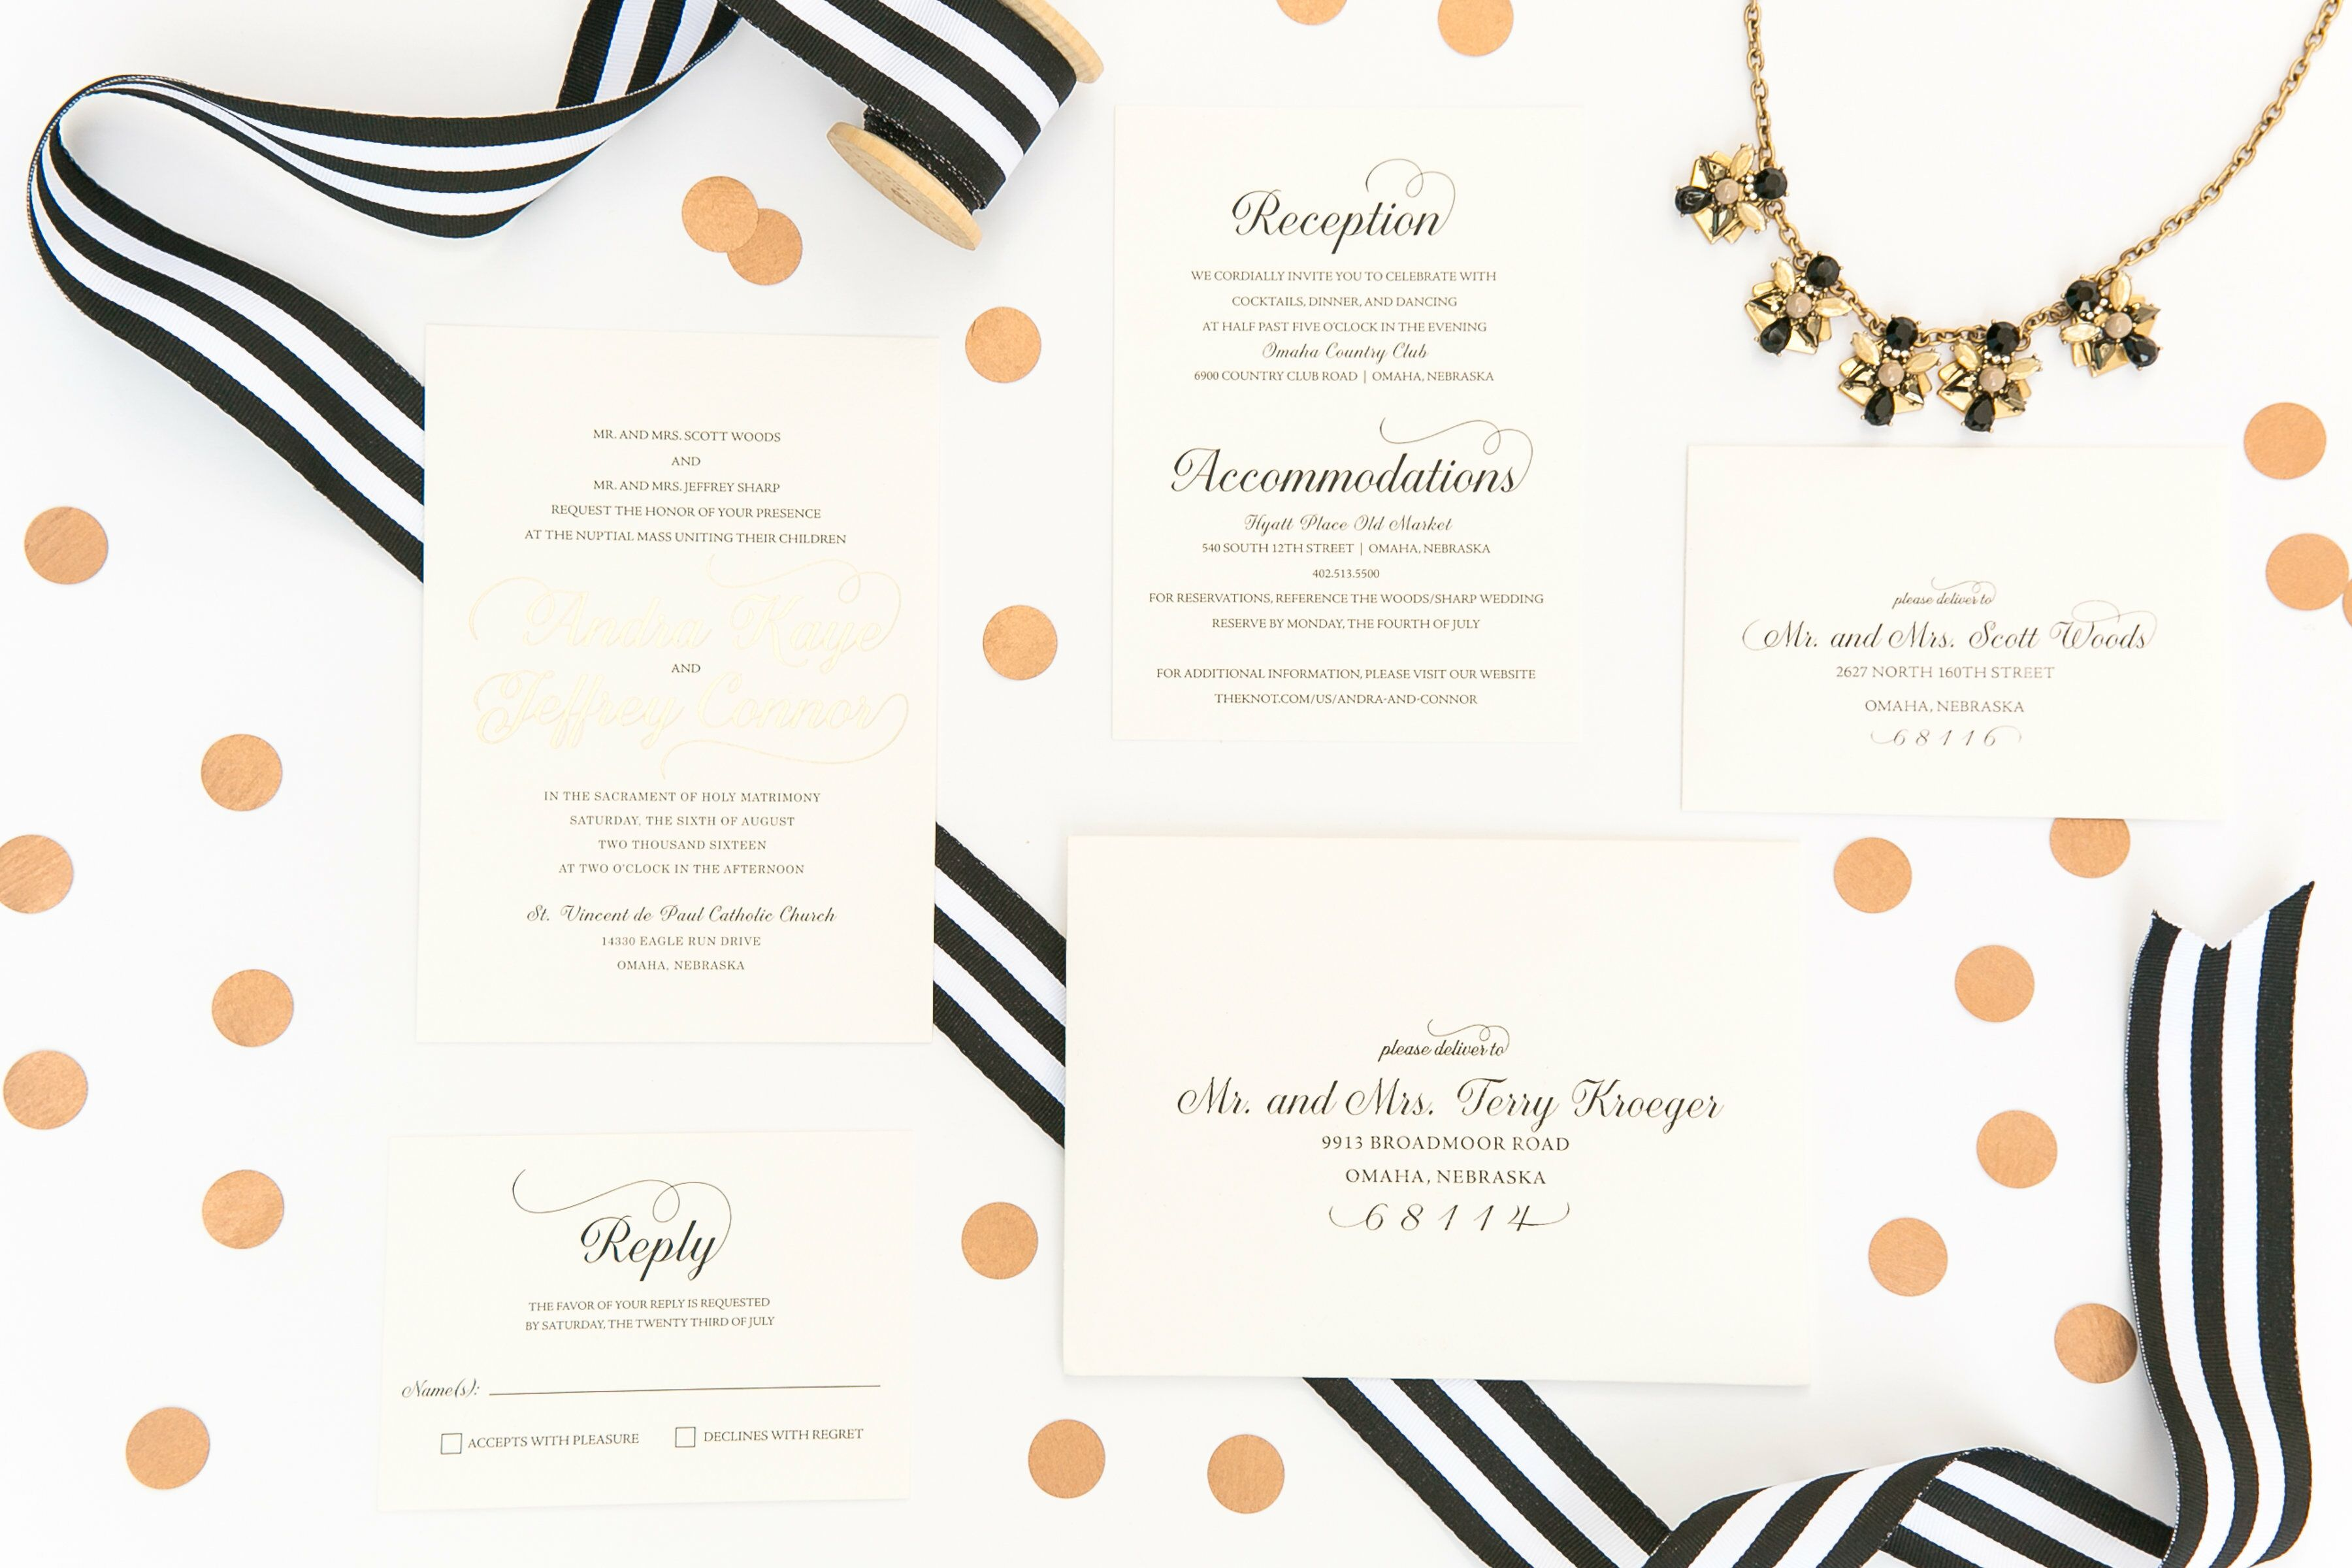 Exelent Wedding Rings Omaha Ne Gallery The Wedding Ideas